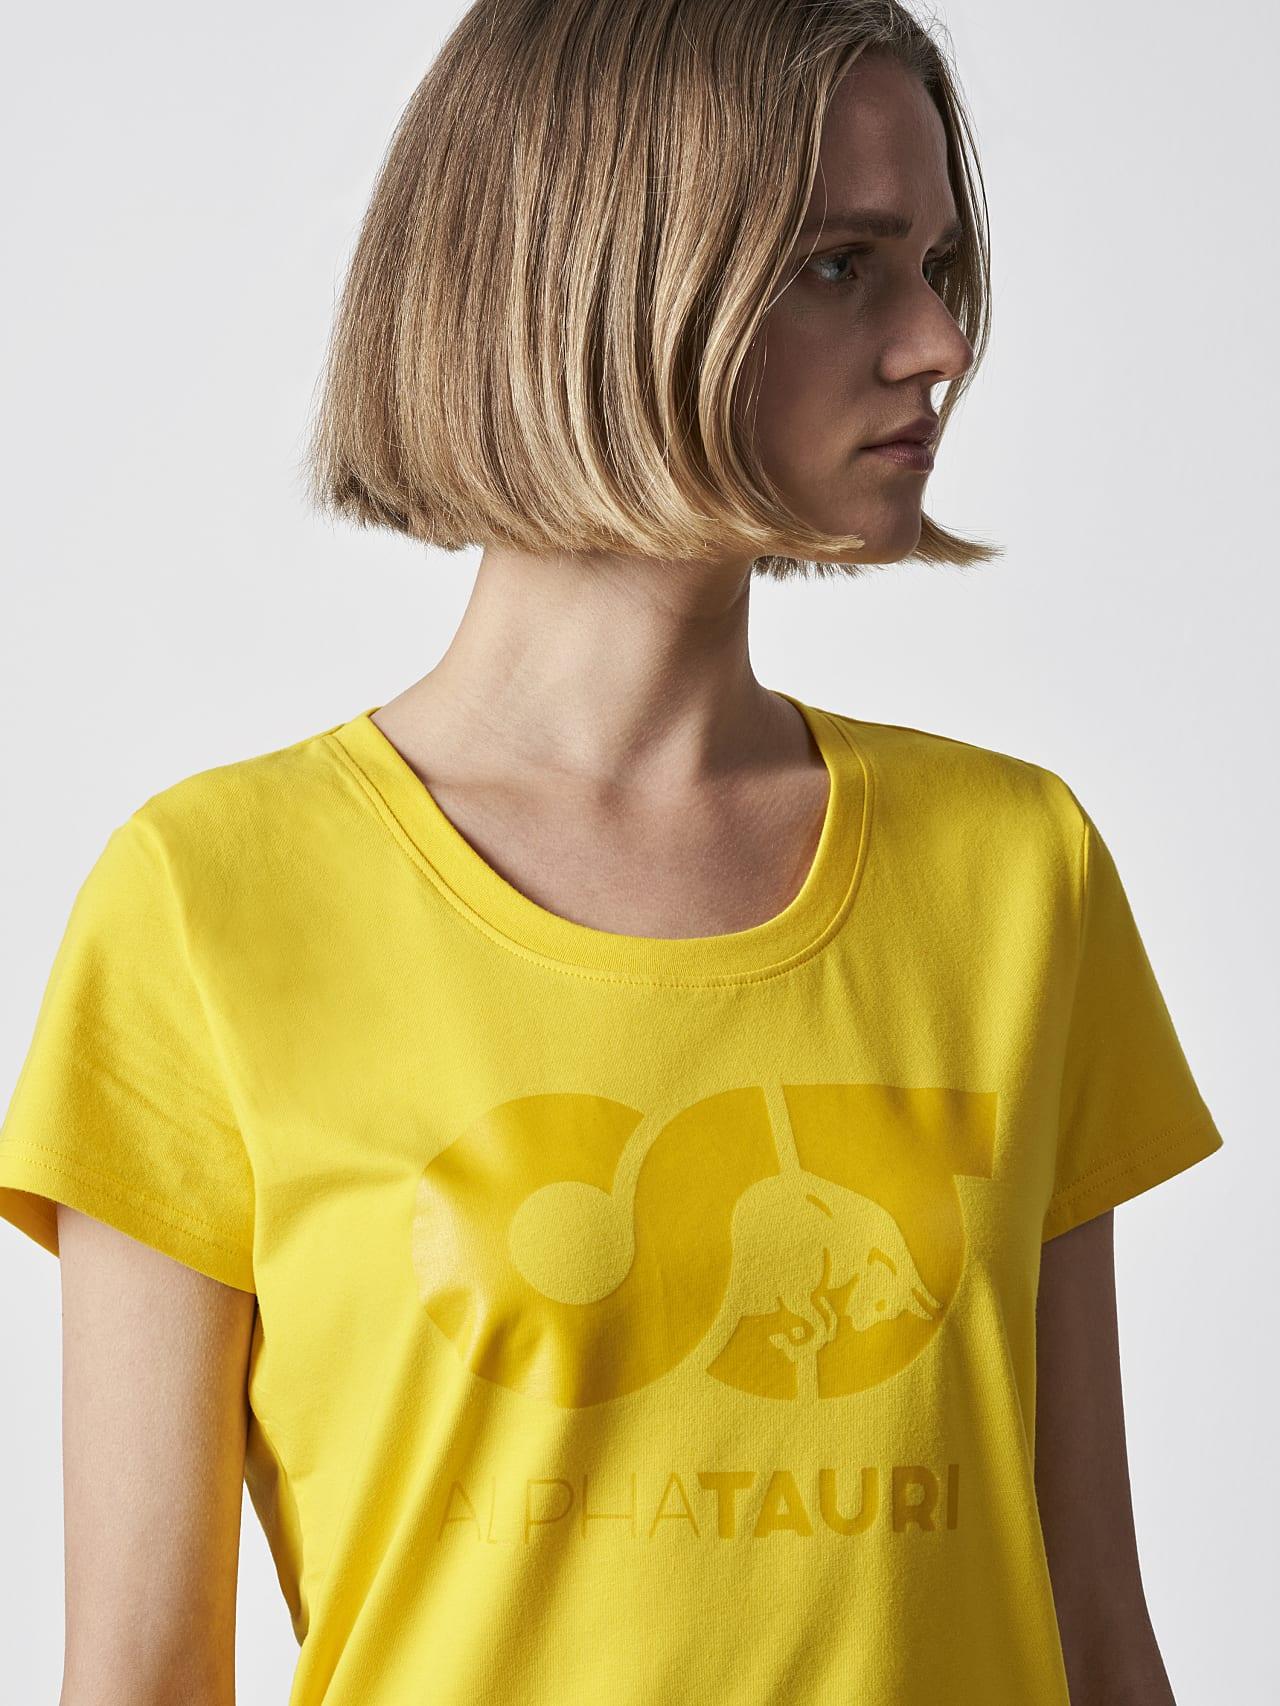 JERU V2.Y4.02 Signature Logo T-Shirt yellow Right Alpha Tauri